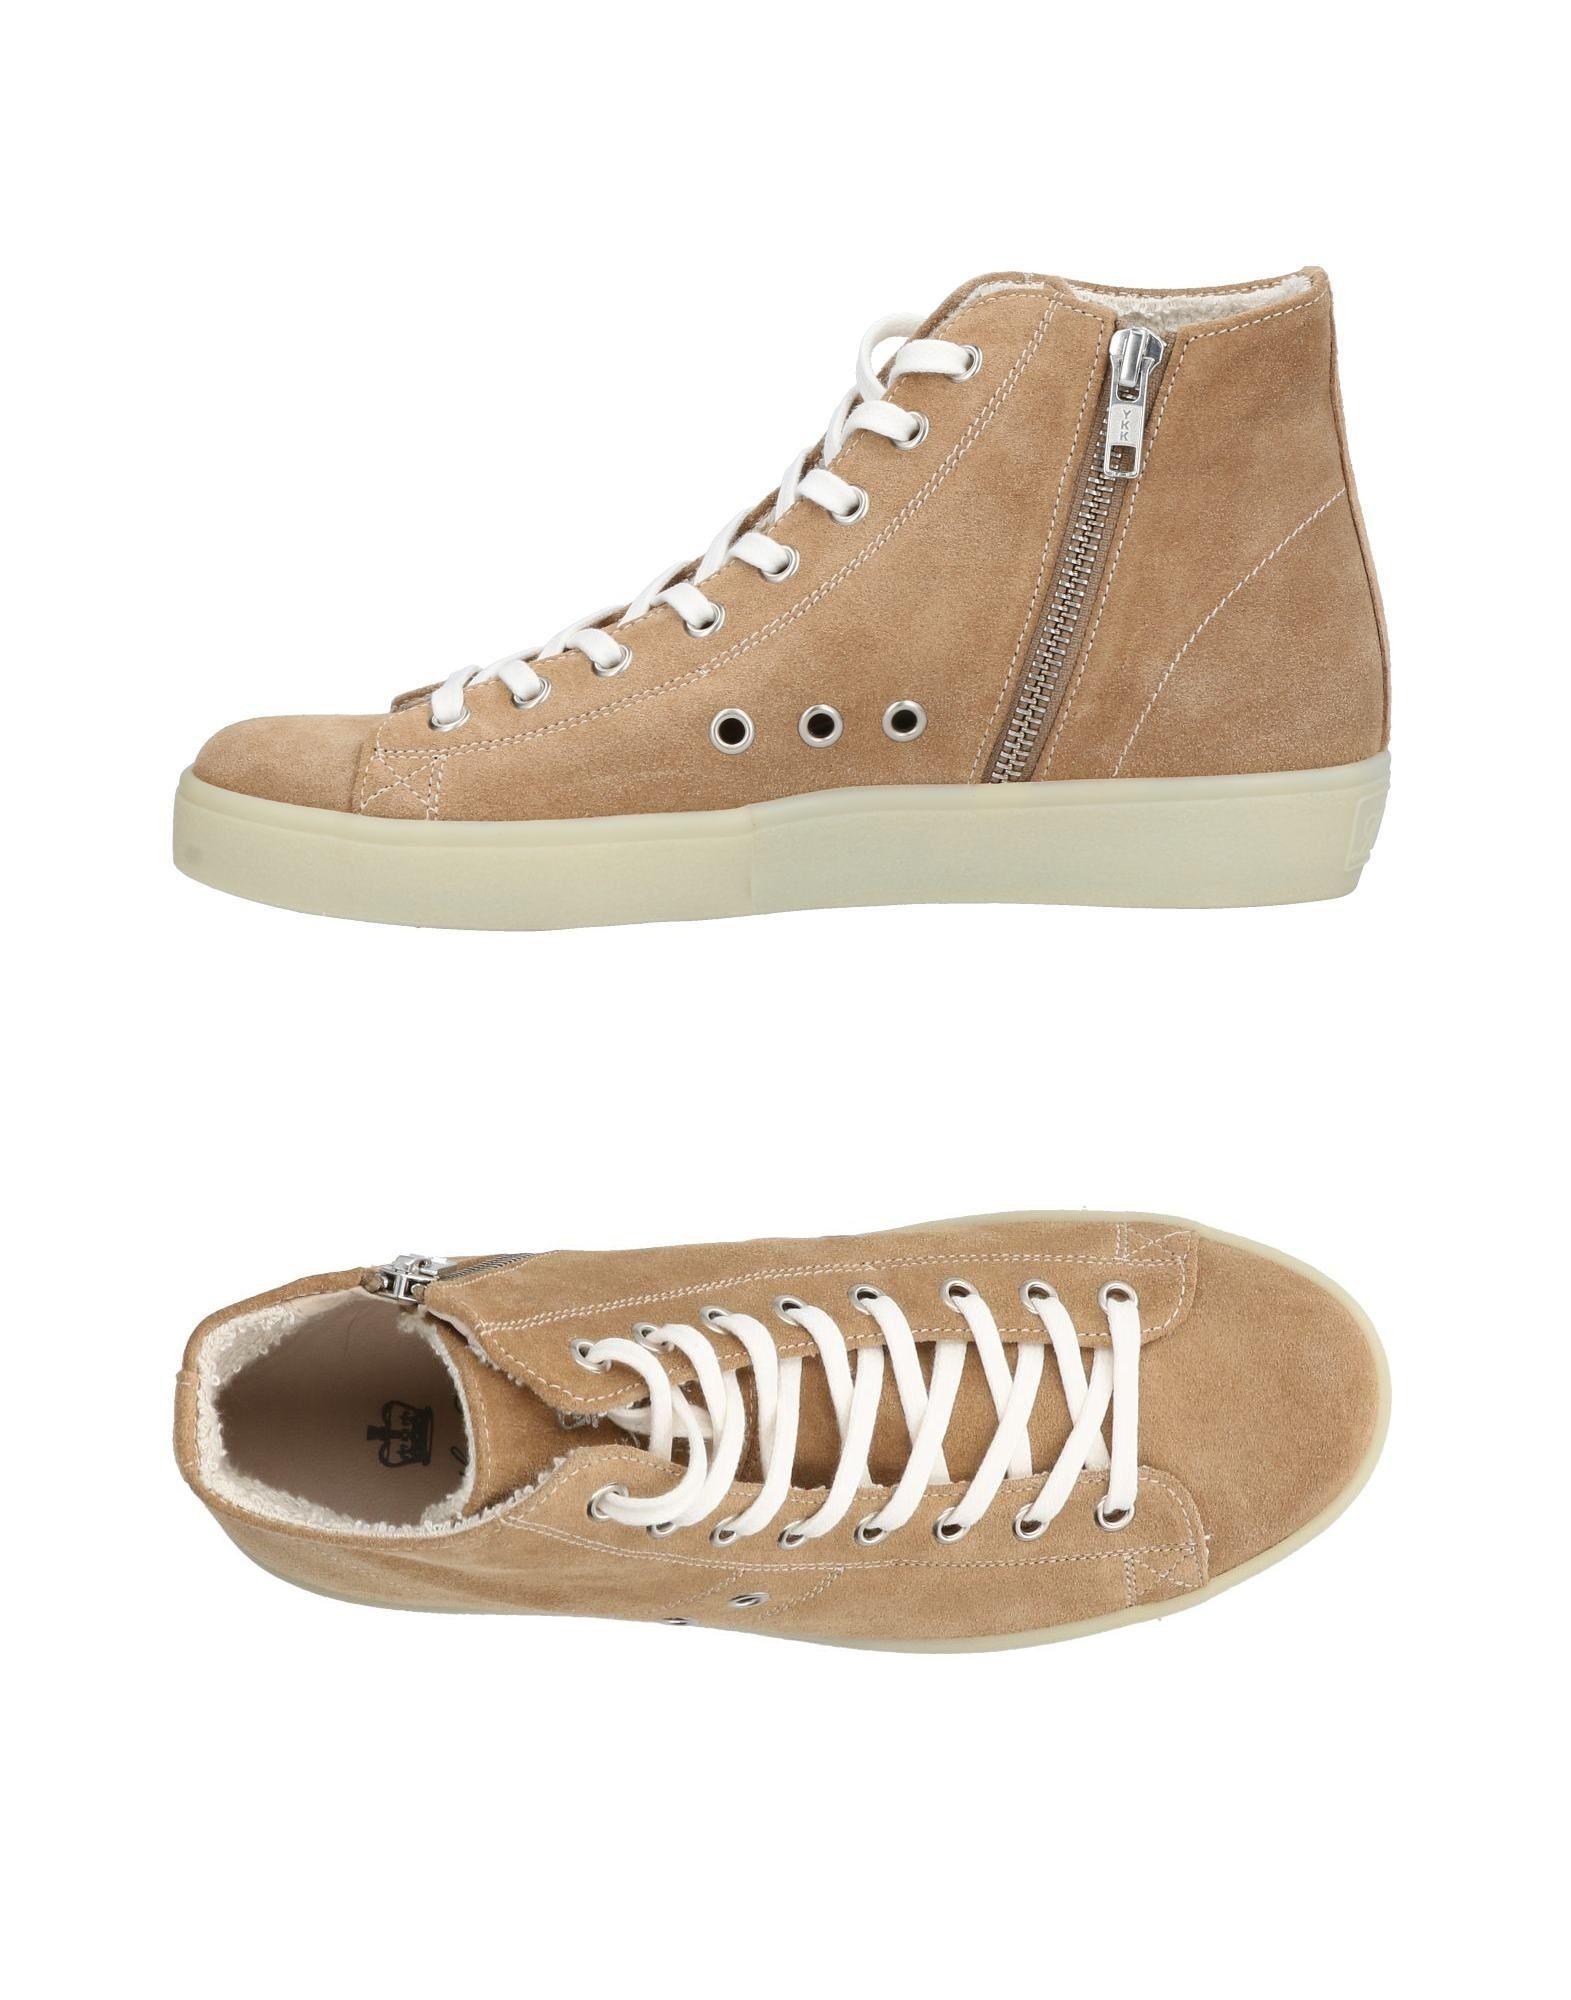 Alessandro Dell'acqua Sneakers Herren  11436649IF Neue Schuhe